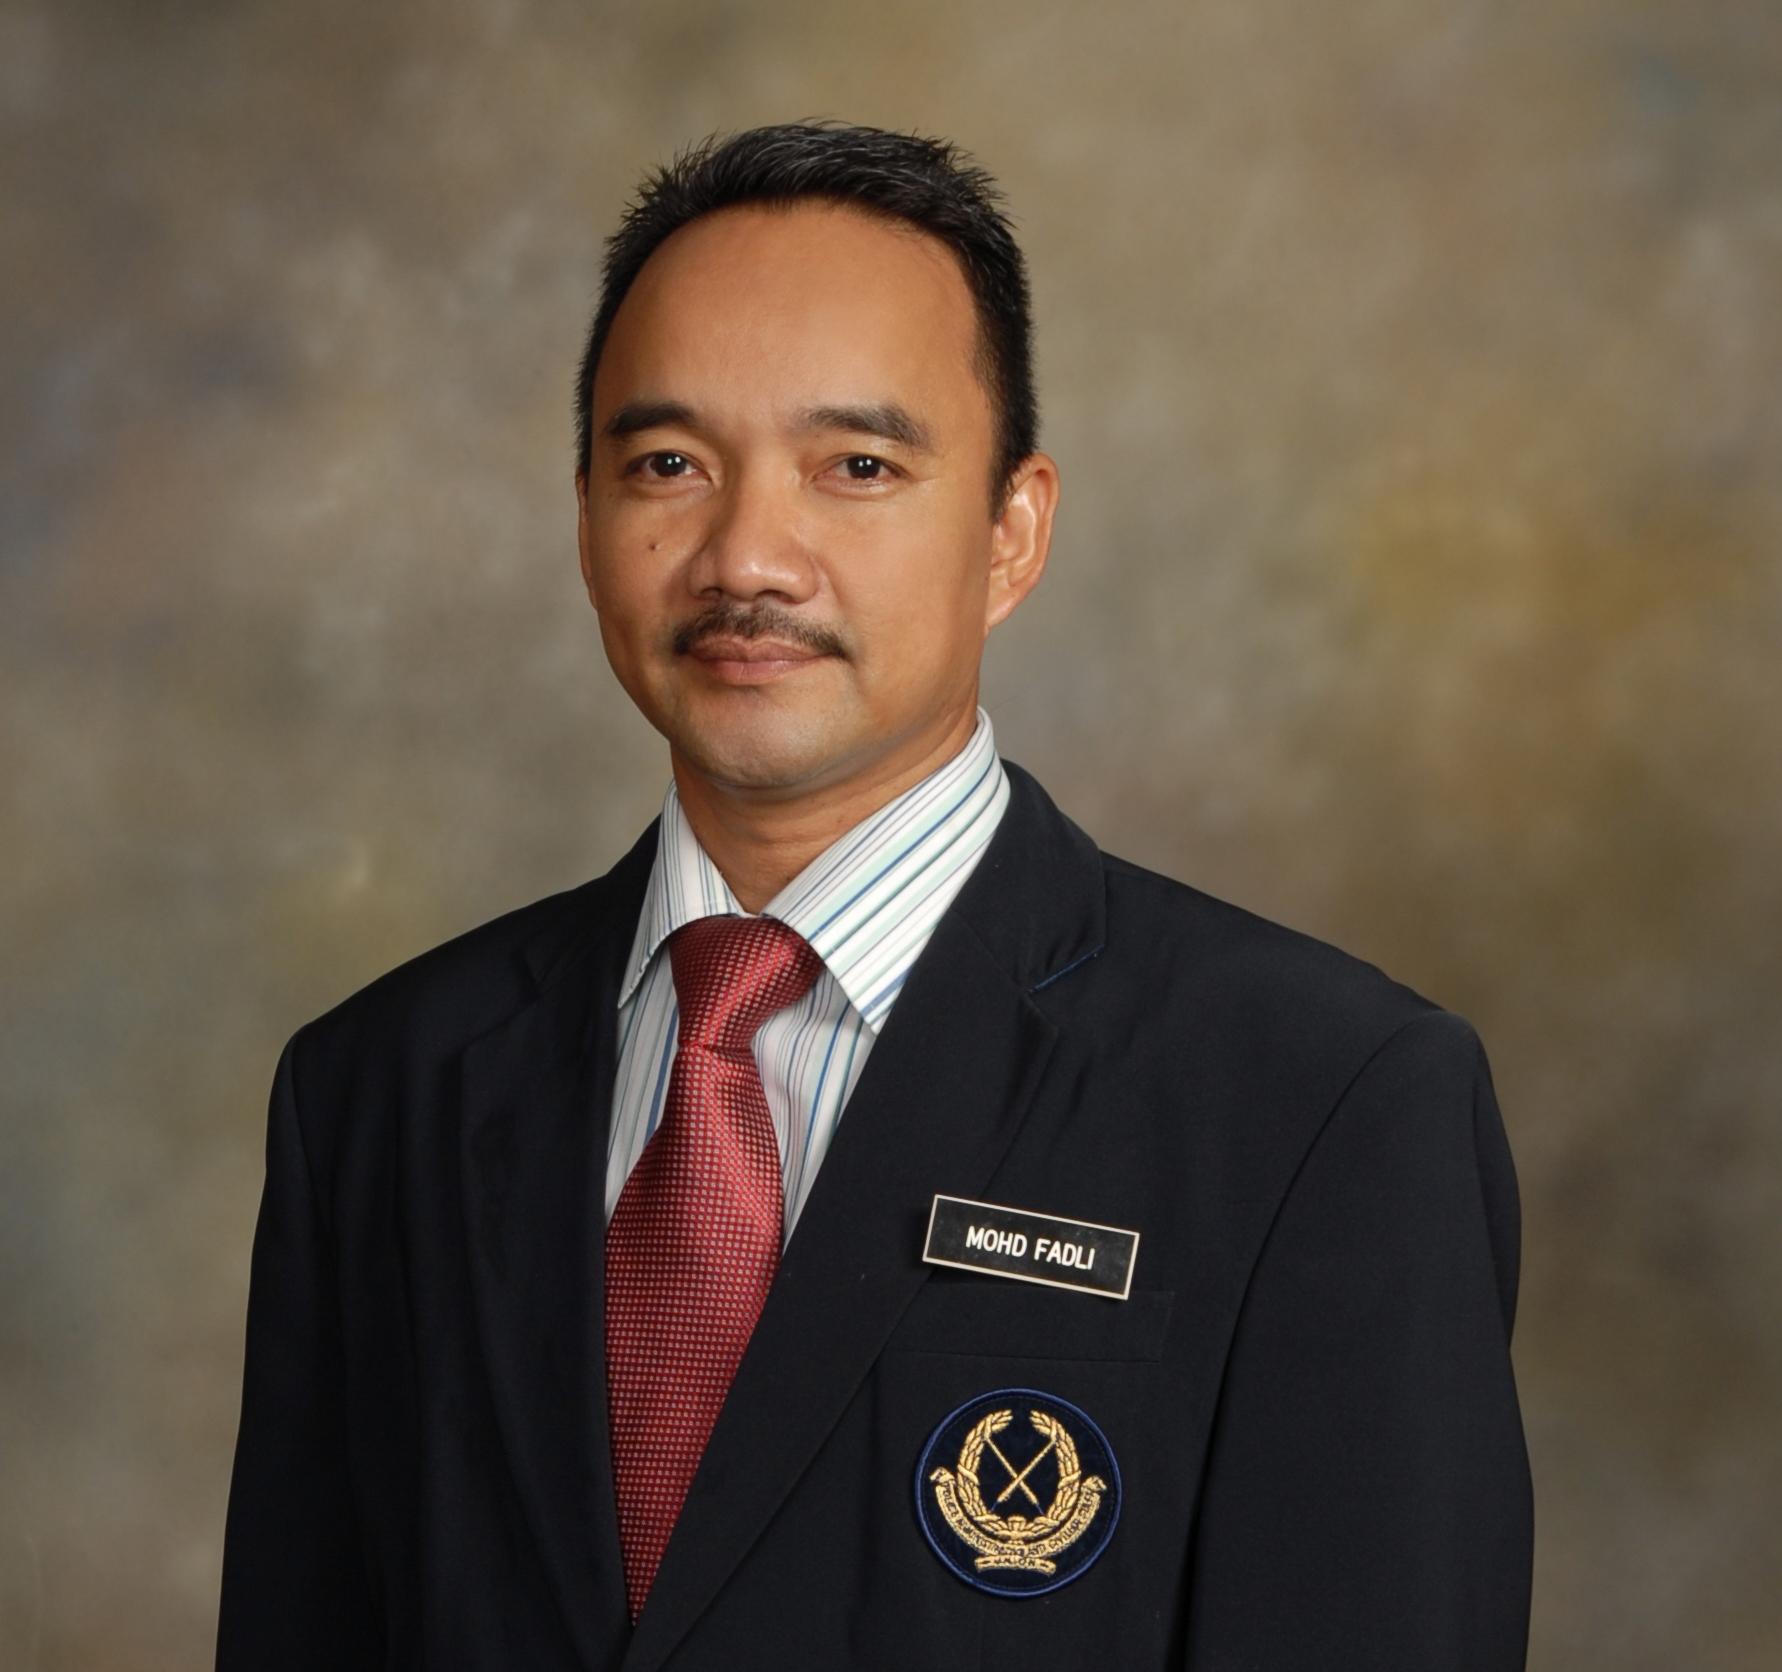 Mohd Fadli Bin Mohd Noor